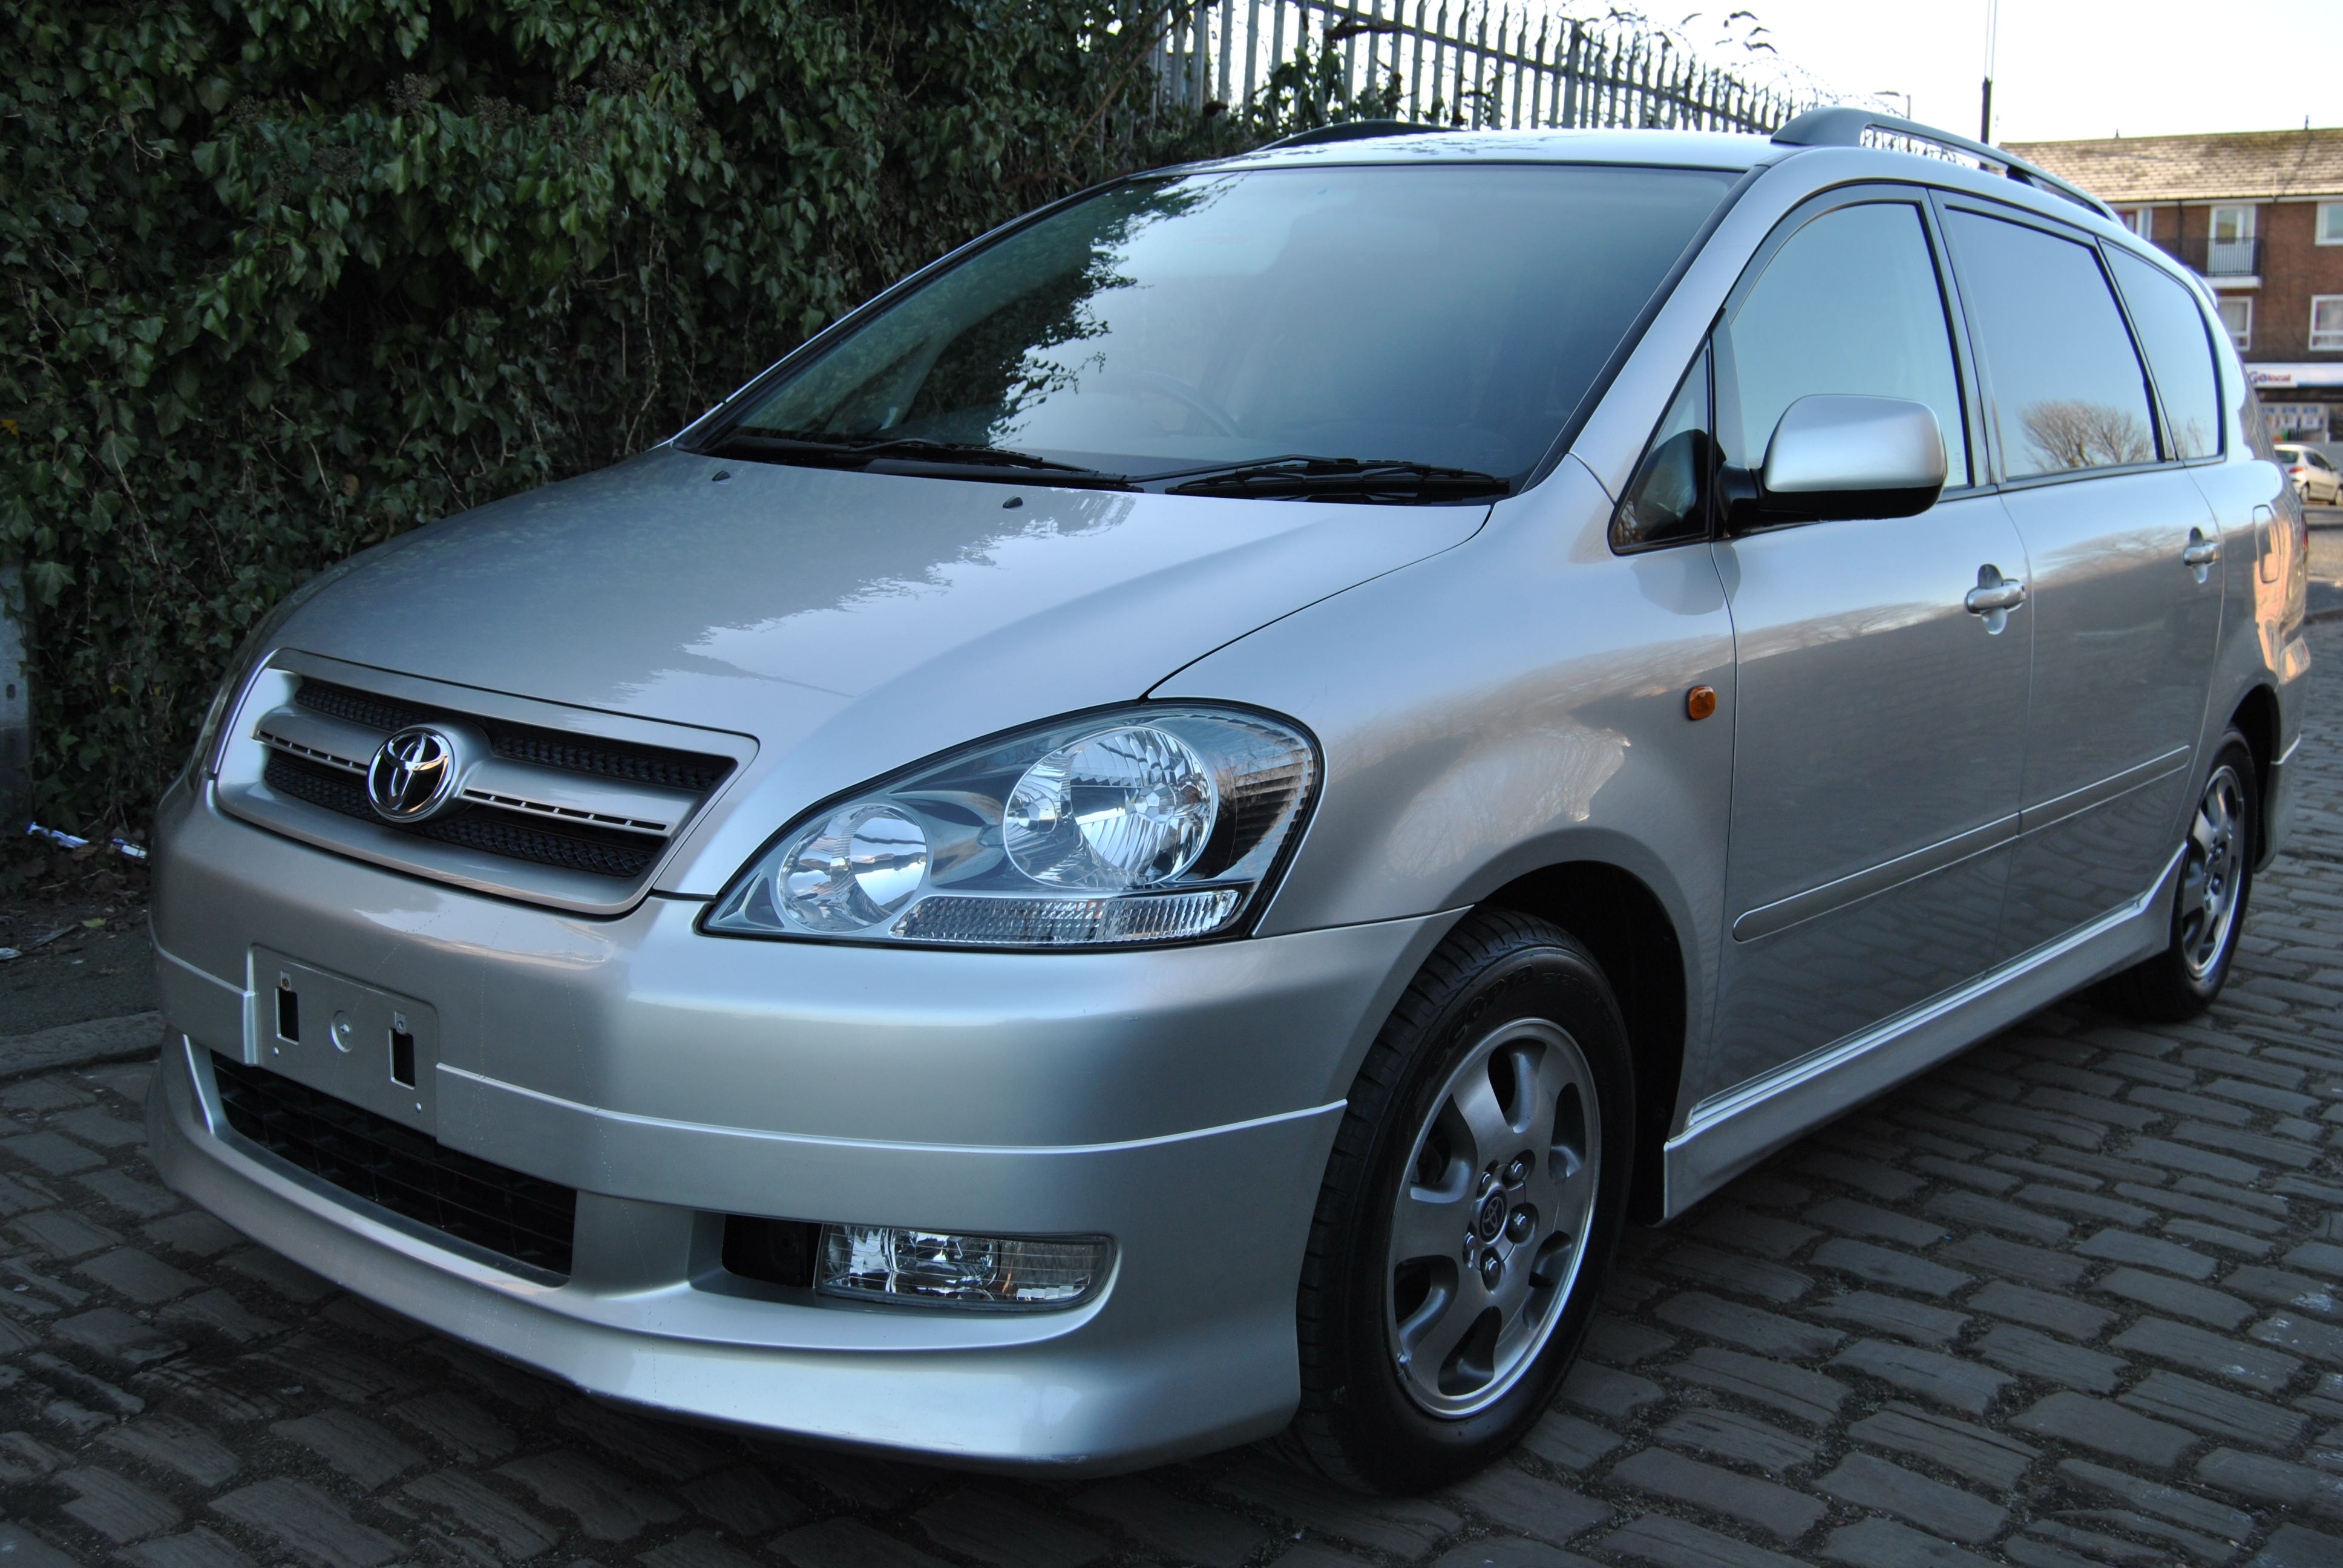 Toyota Ipsum I (M10) 1995 - 2001 Compact MPV #5